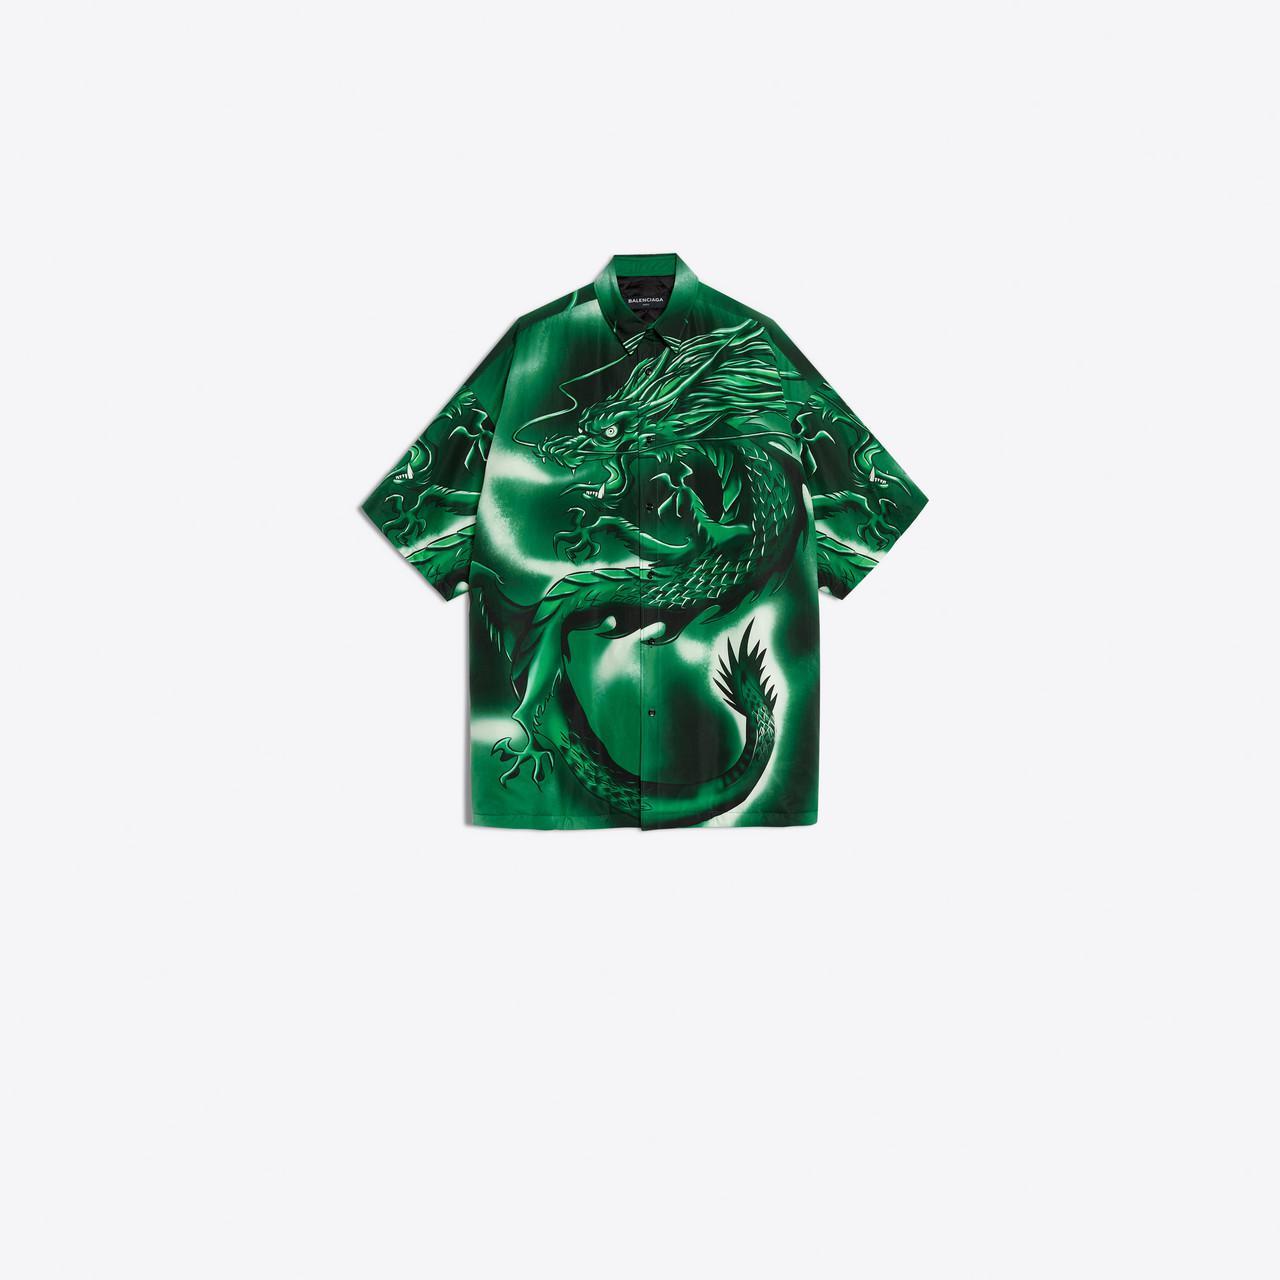 9fafad26a Balenciaga Bal Dragon Shirt in Green for Men - Lyst